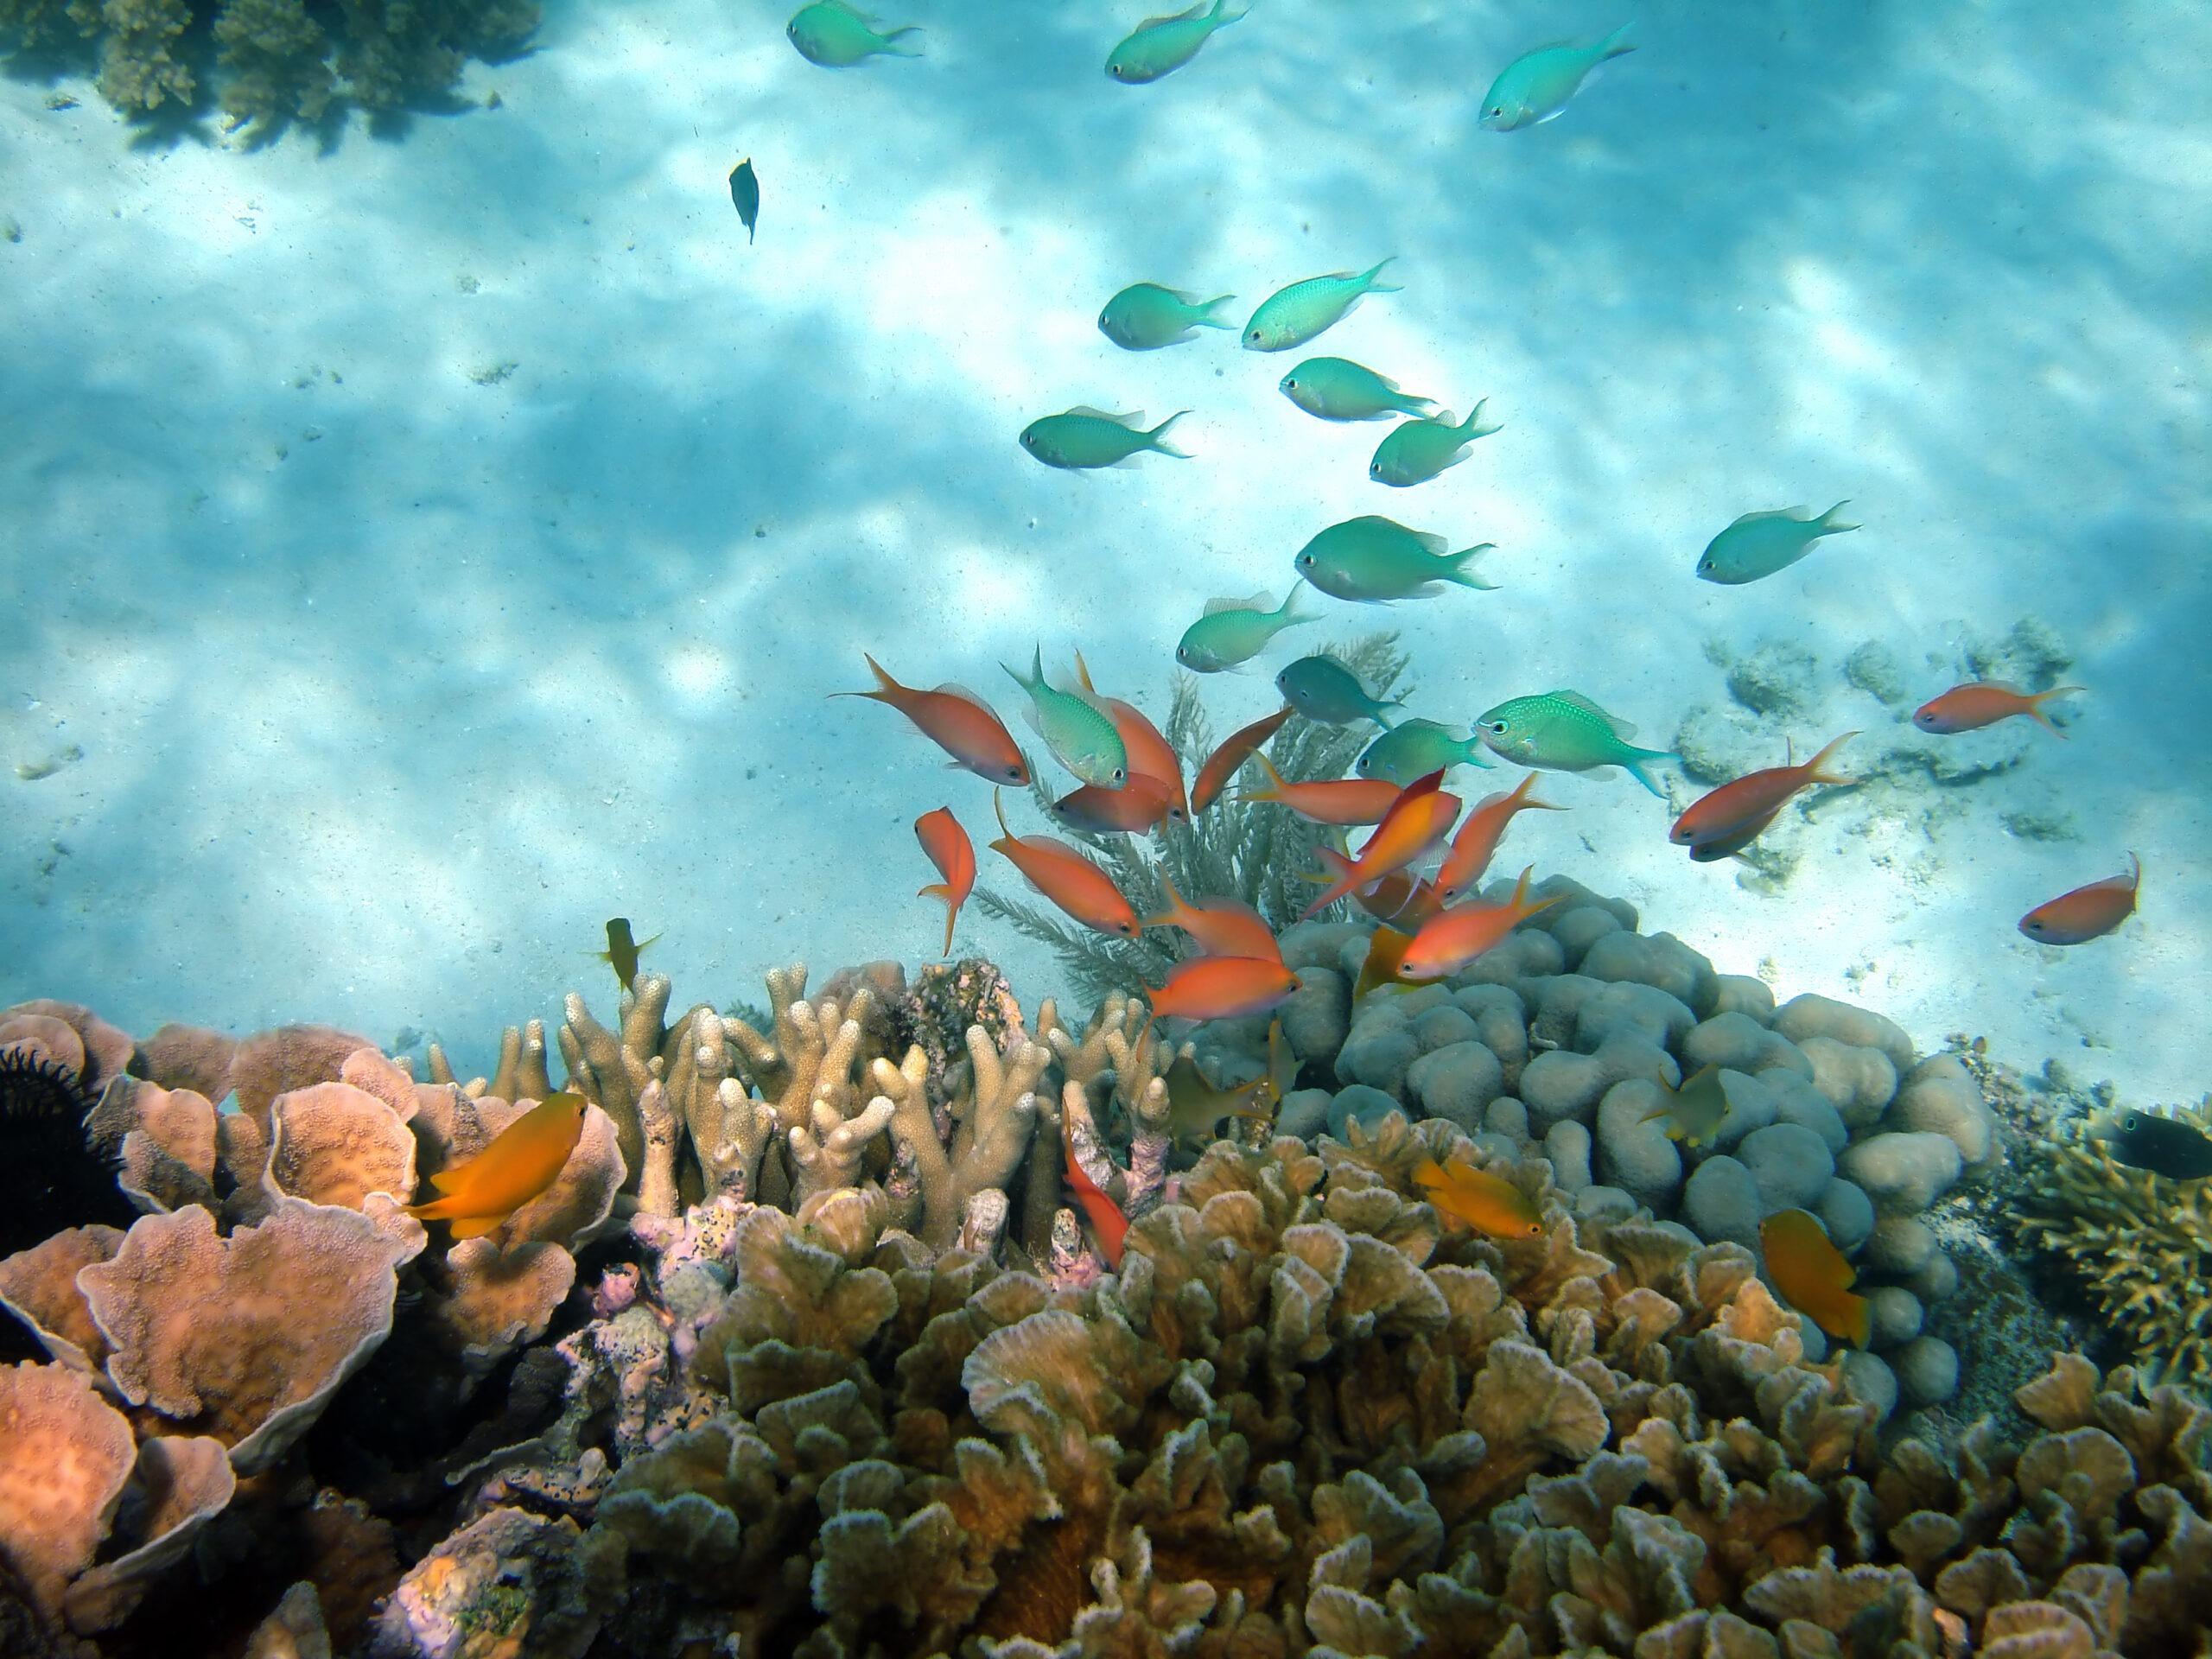 Indonesia-Bali-Lombok-Island-Shutterstock_23620159